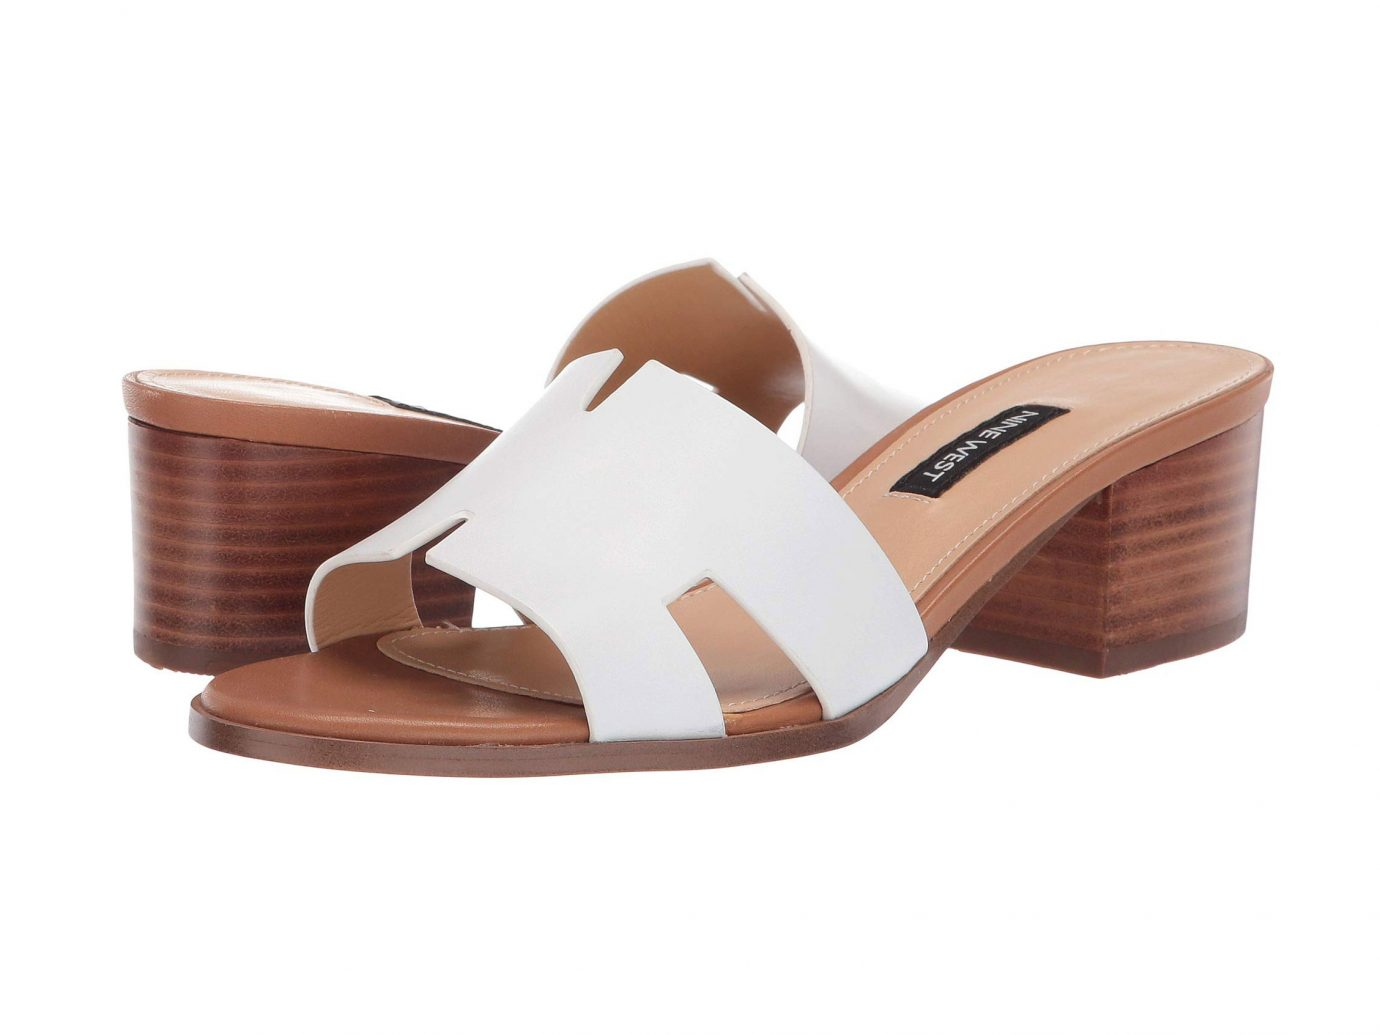 Nine West Aubrey Heeled Sandal